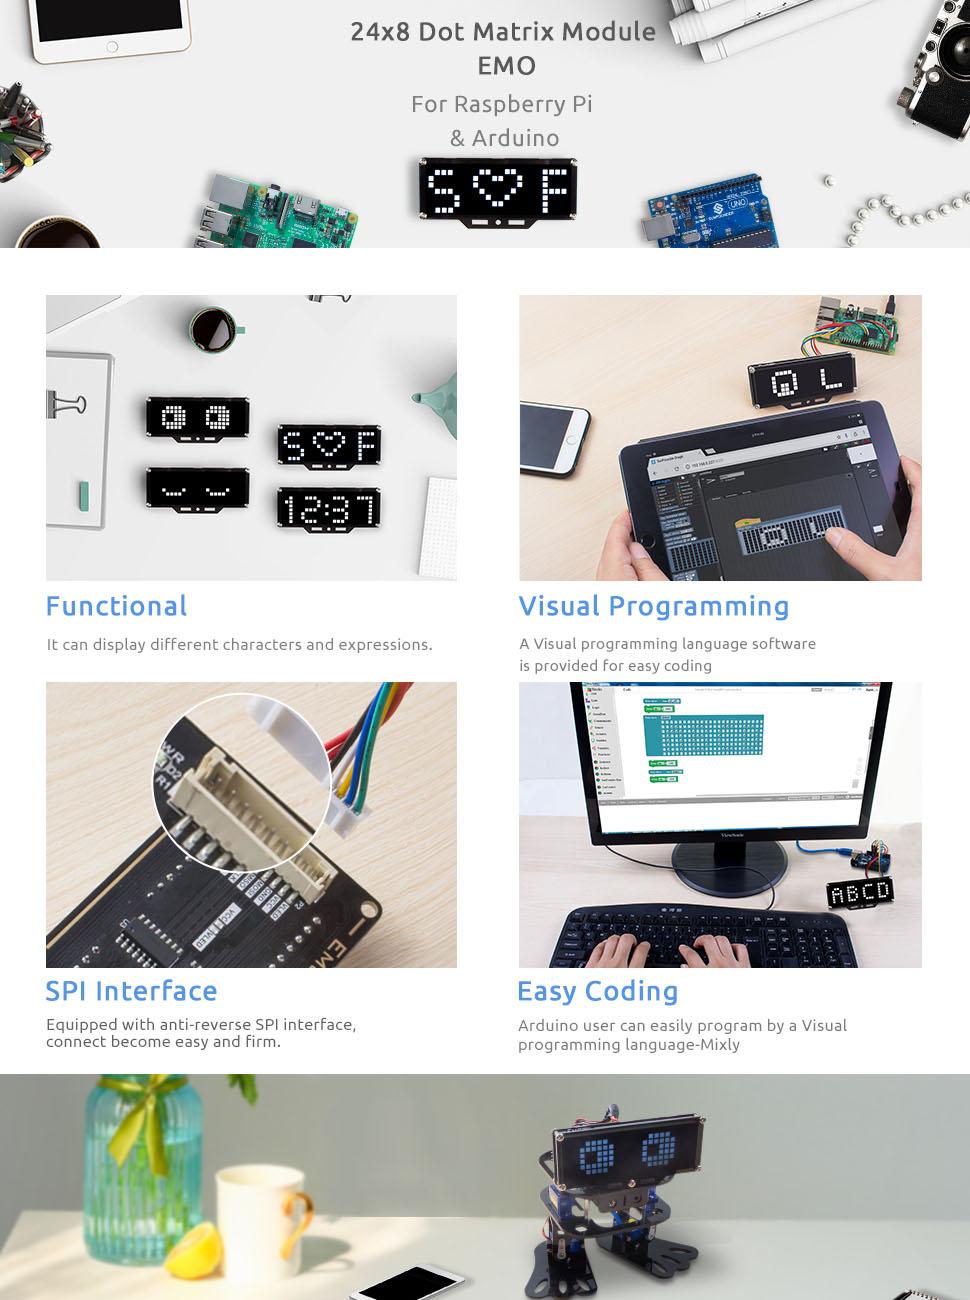 Особенностисветодиодного матричного модуля для Arduino и Raspberry Pi